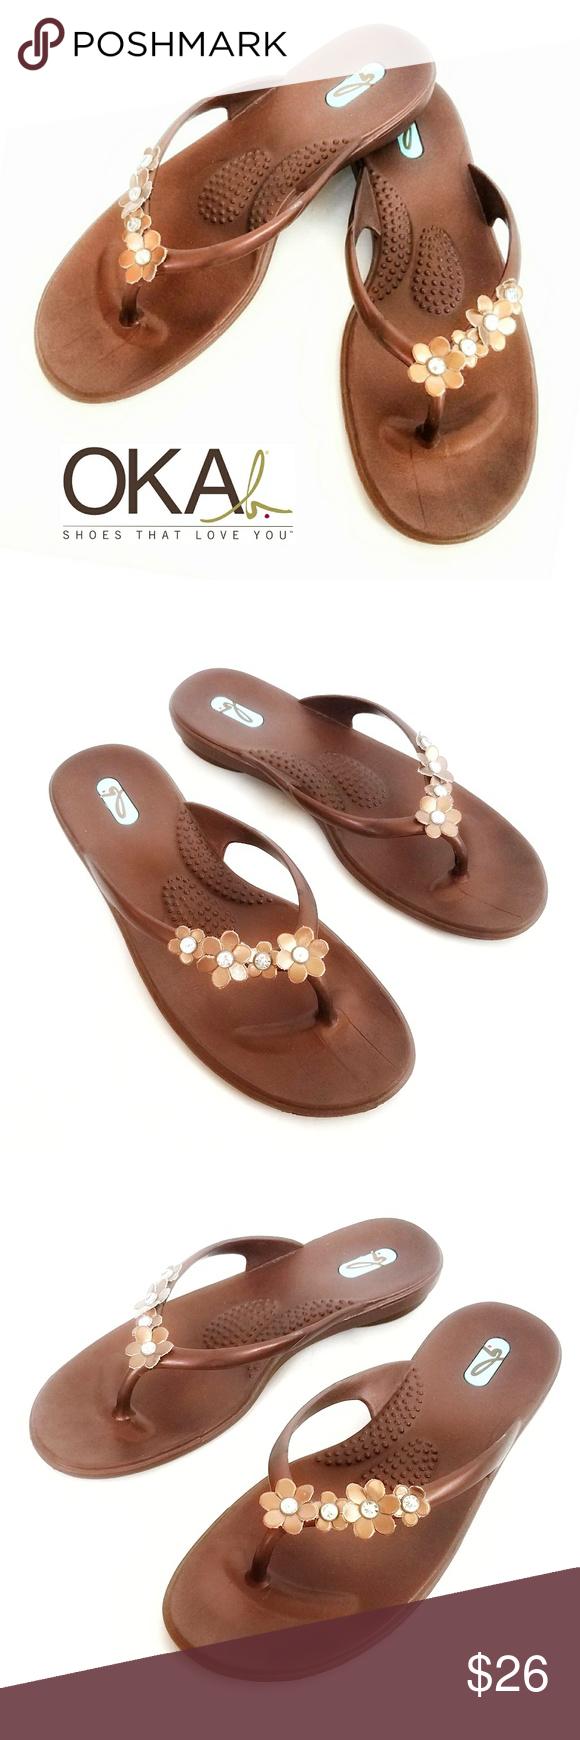 92af221849a348 OKA b. Malia Copper Flip Flop Sandals M-L Malia Copper Flip Flop Sandals by  OKA